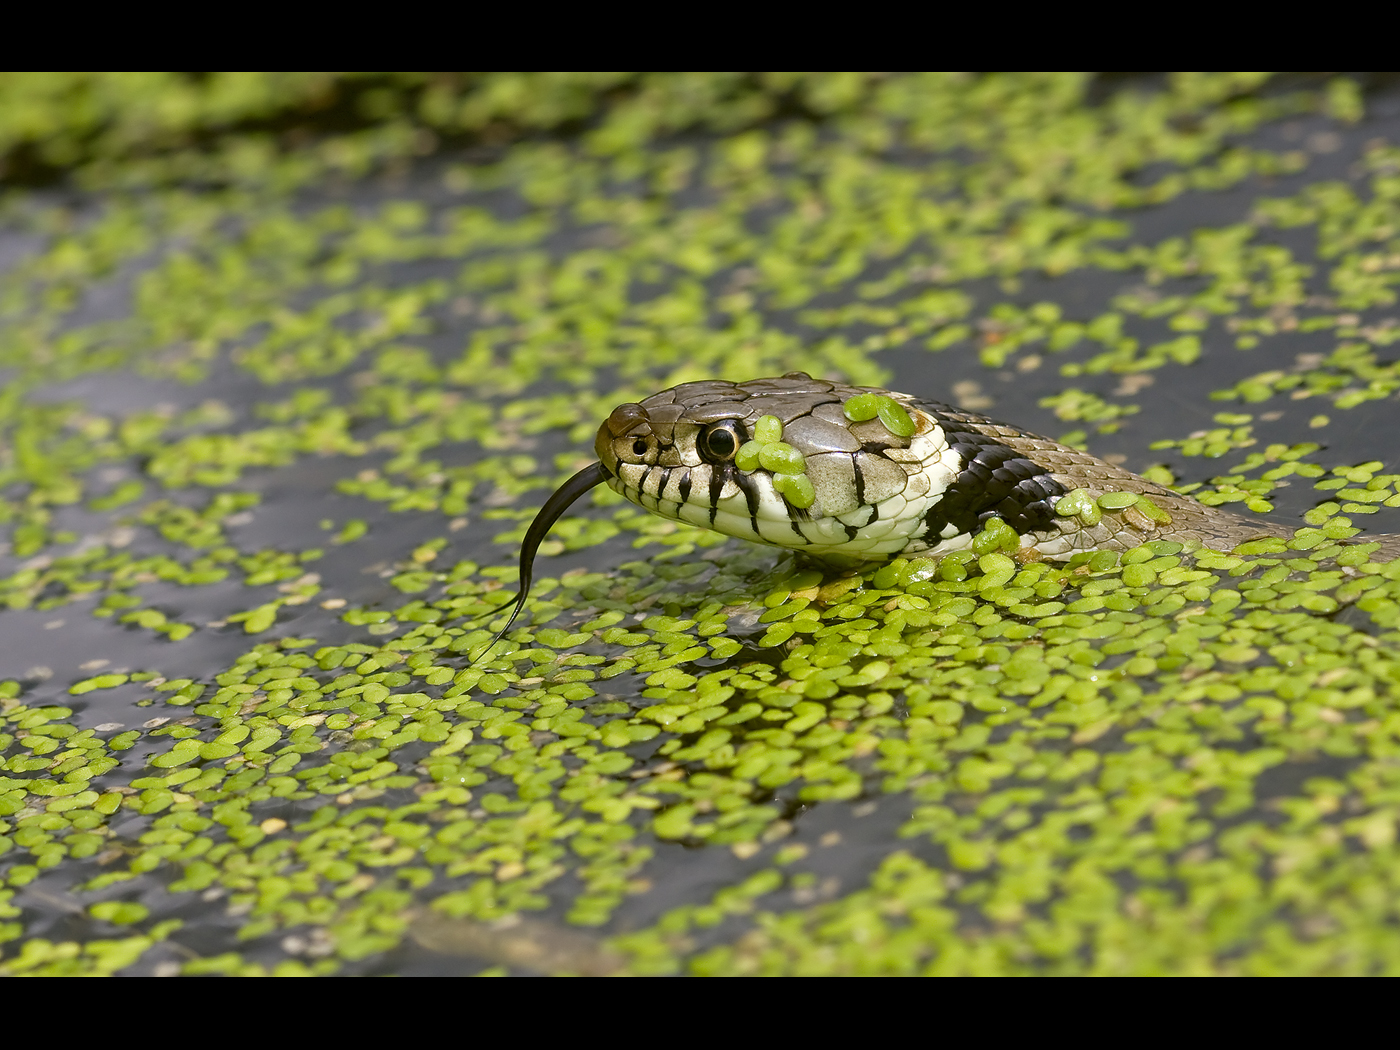 Grass snake swimming